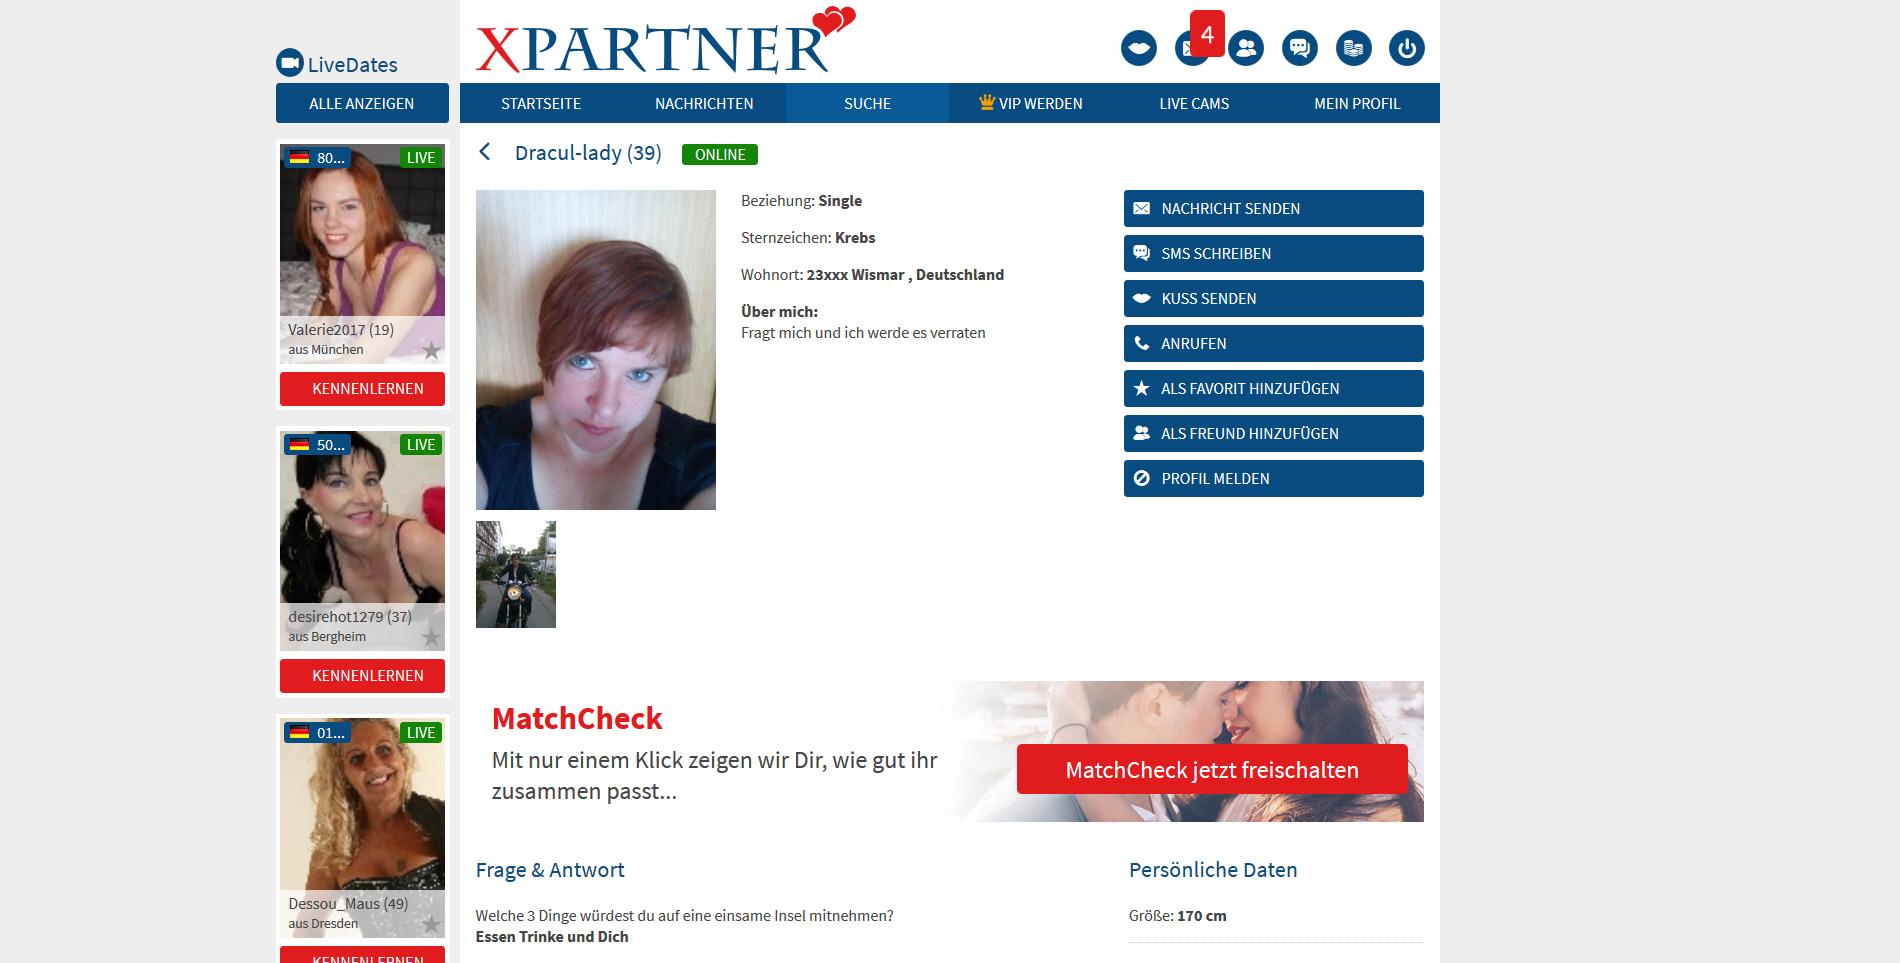 XPartner.com - Tests & Erfahrungsberichte - Datingleaks.com